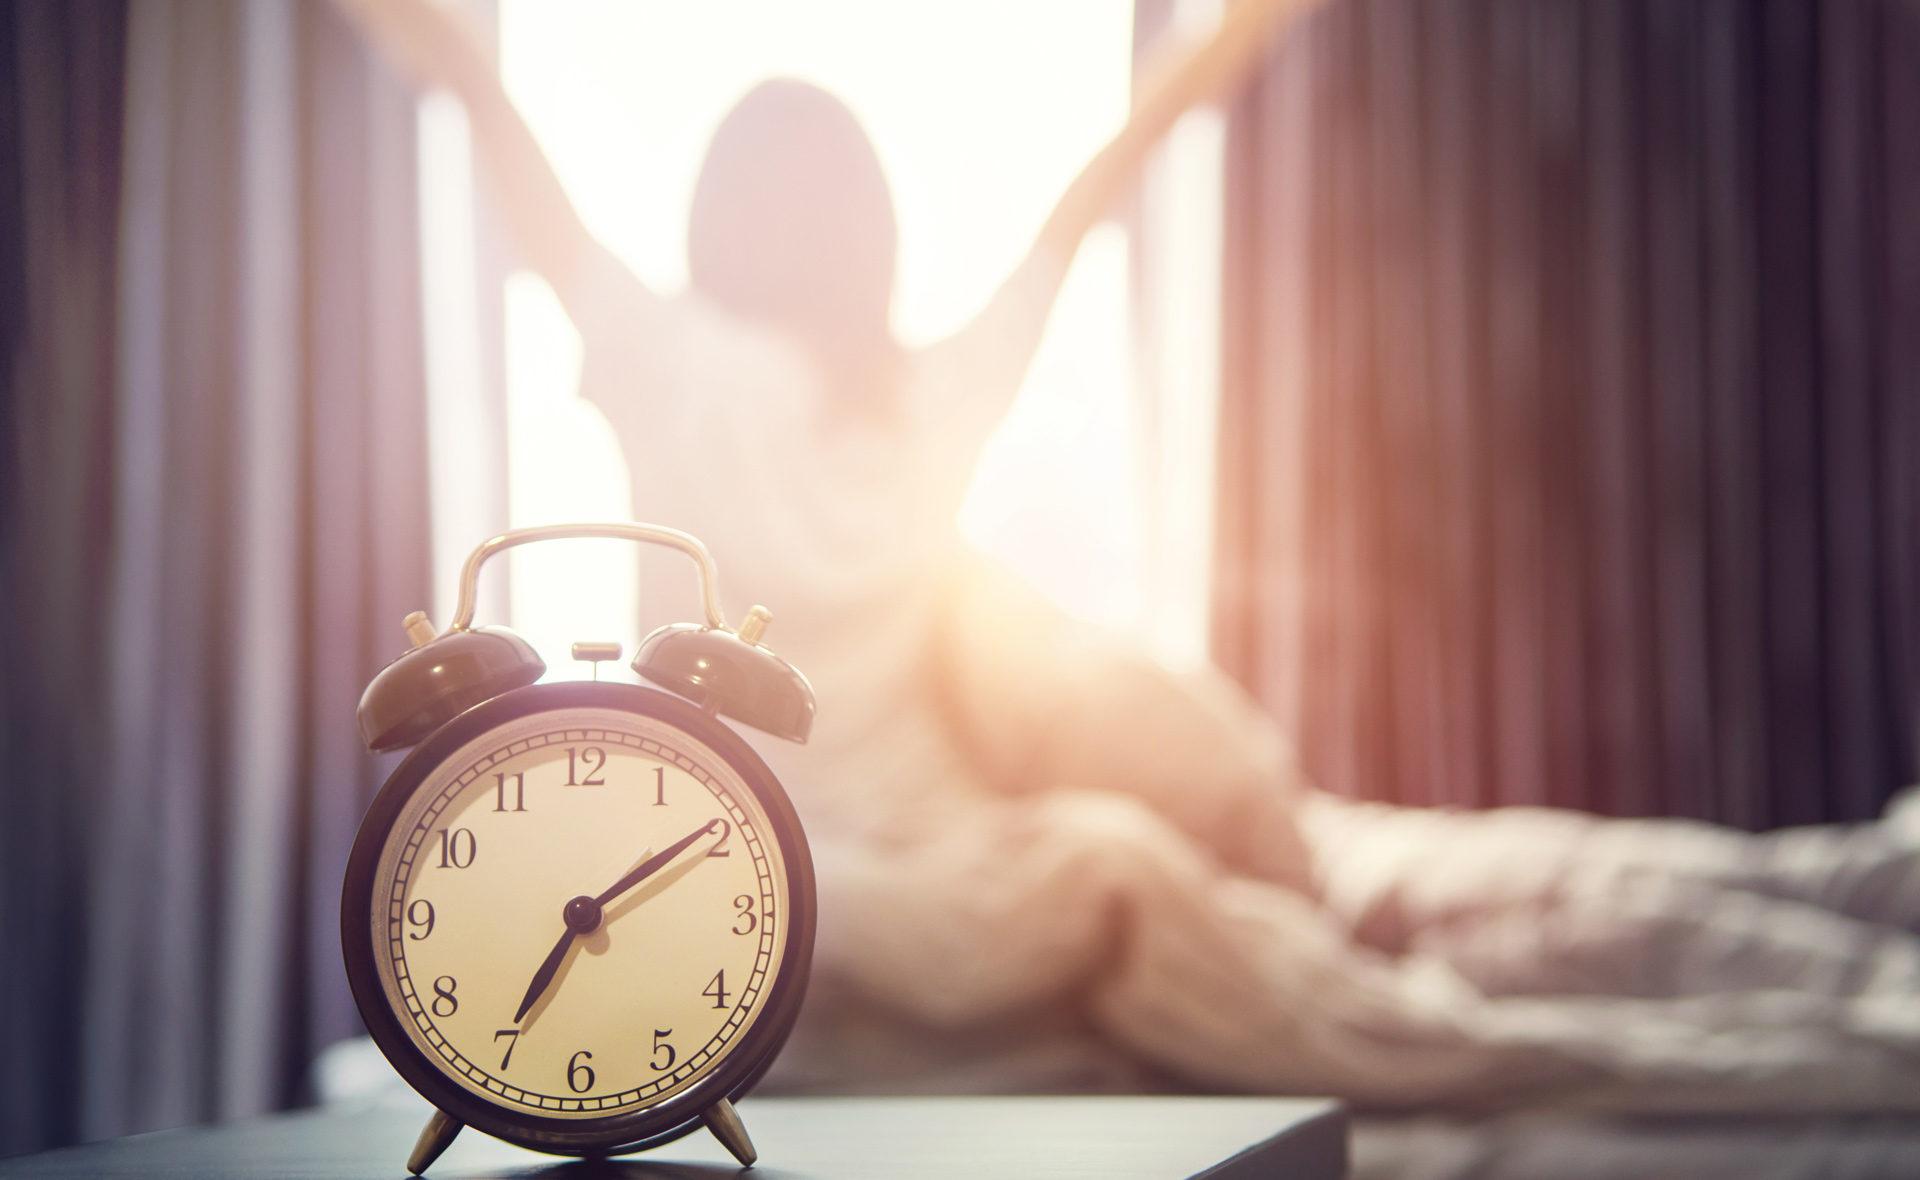 vuelta-trabajo-rutinas-madrugar-